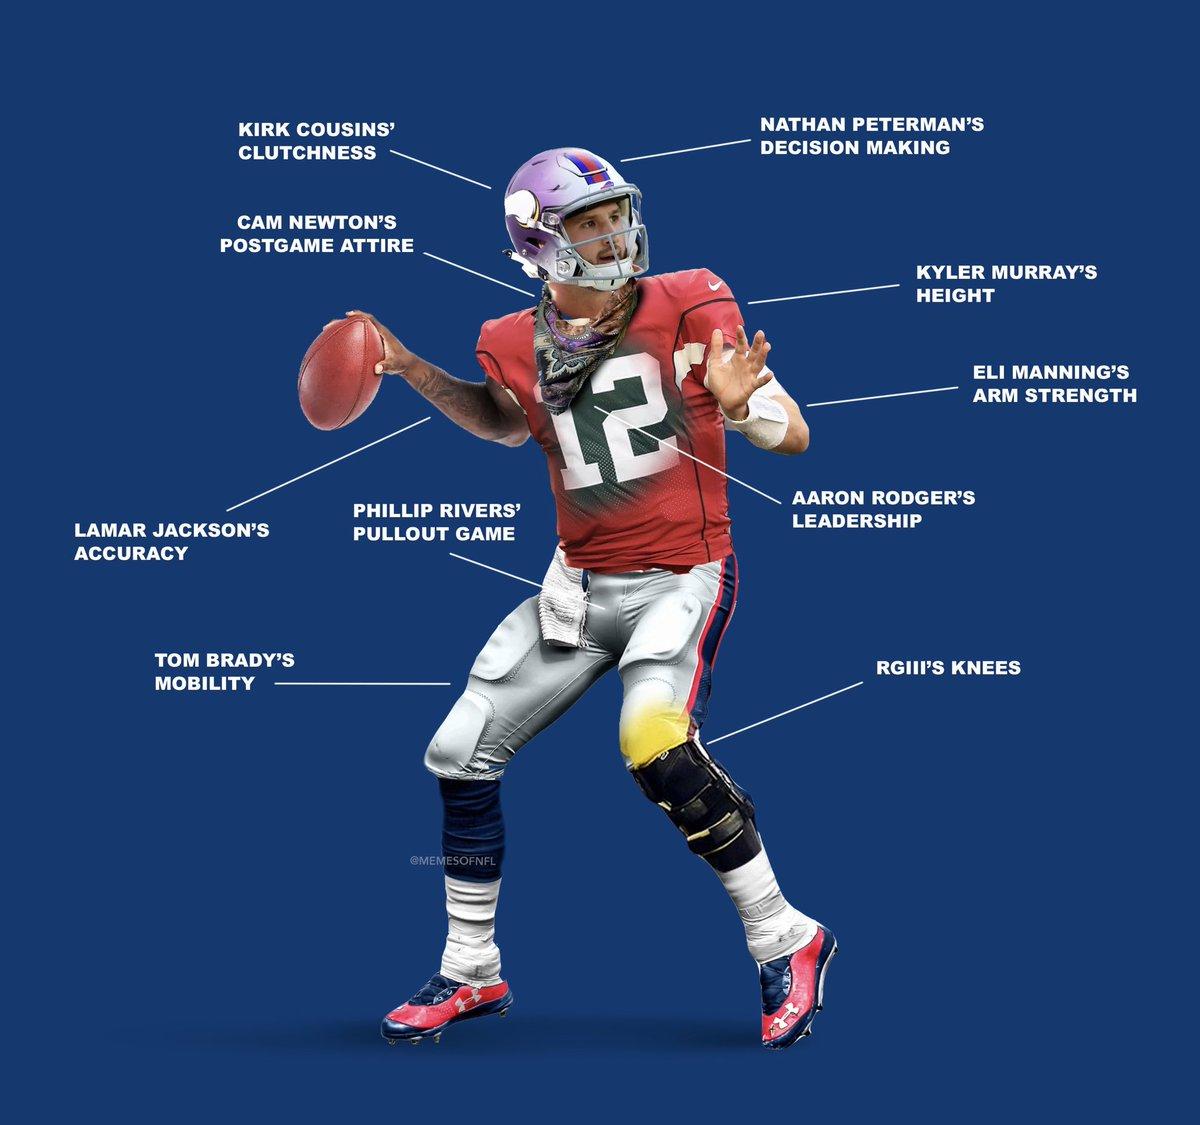 Building the worst possible NFL quarterback 😂